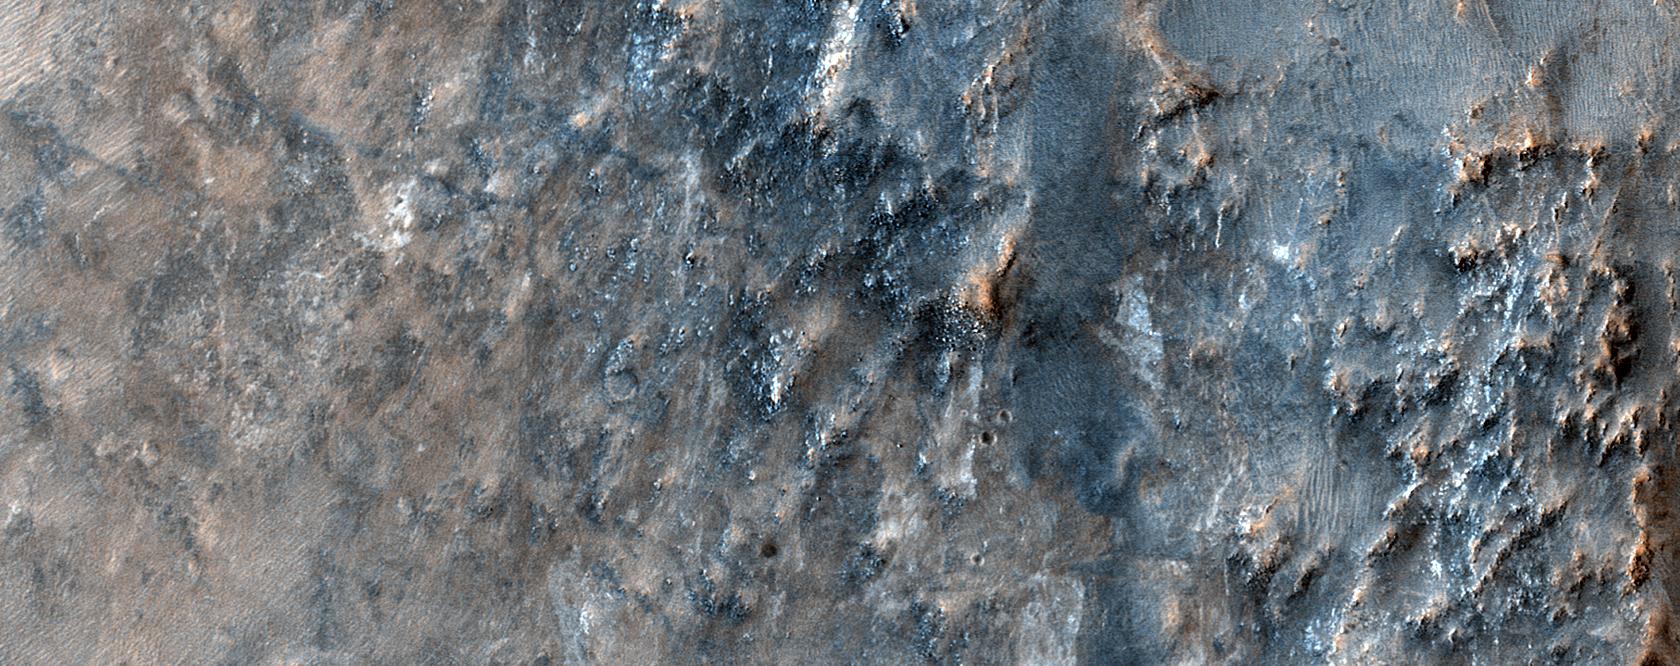 The Bedrock Riddles of Nili Fossae